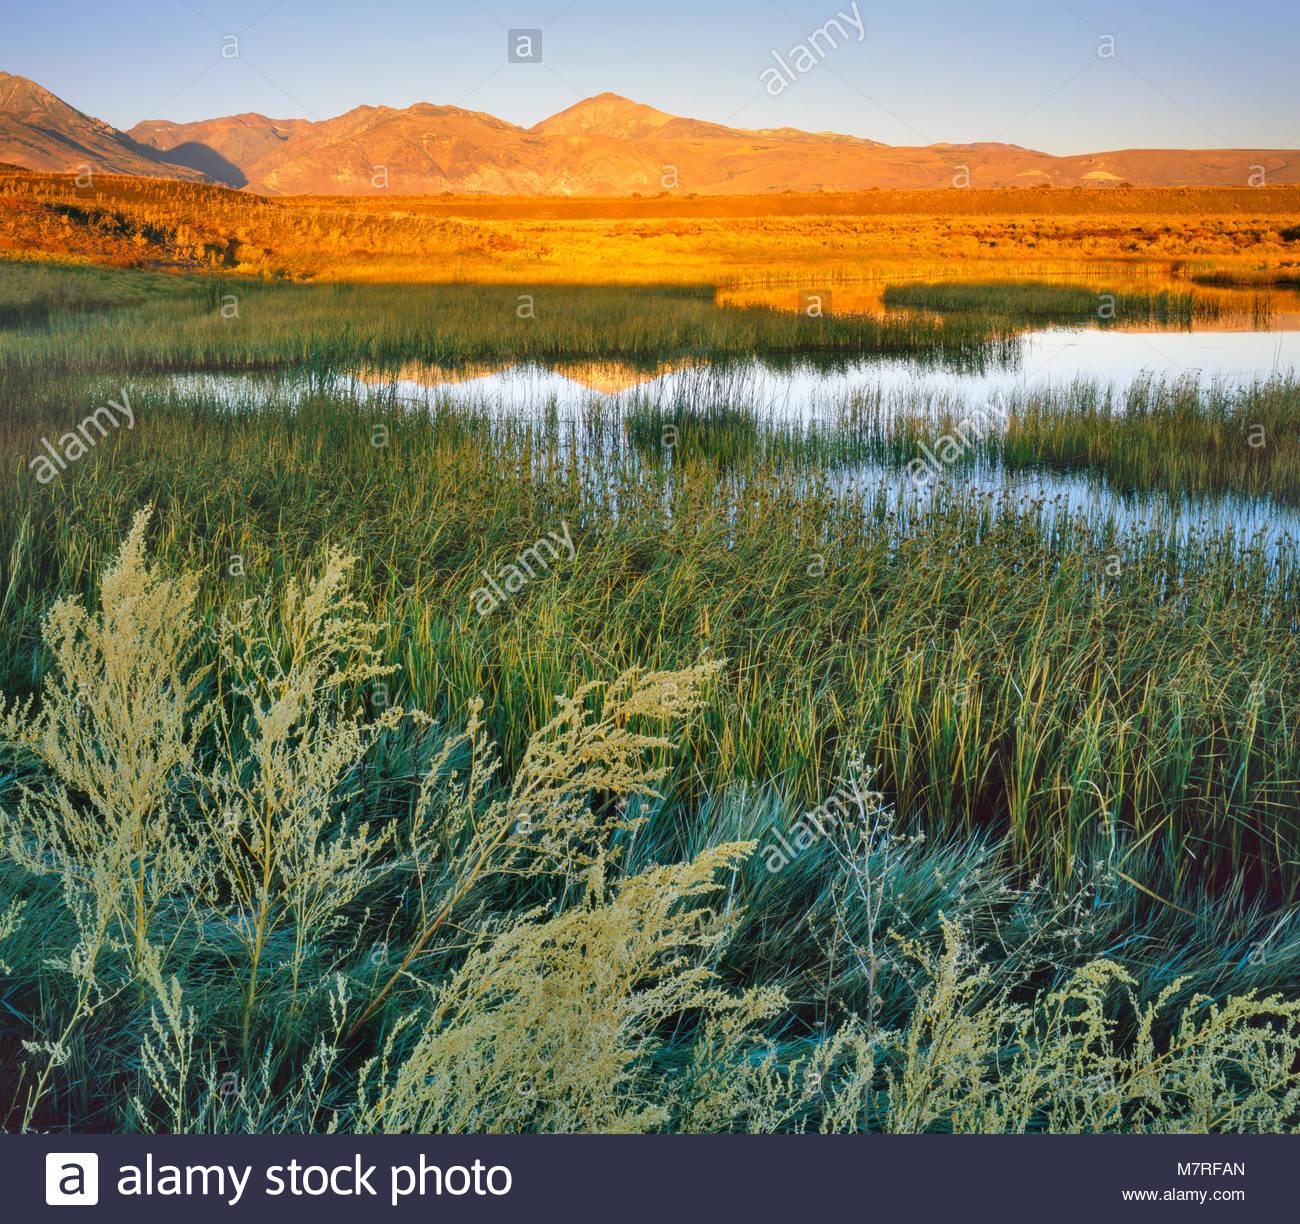 Spring-fed Ponds and Wetlands, DeChambeau Ponds, Mono Lake, Mono Basin National Forest Scenic Area, California - Stock Image